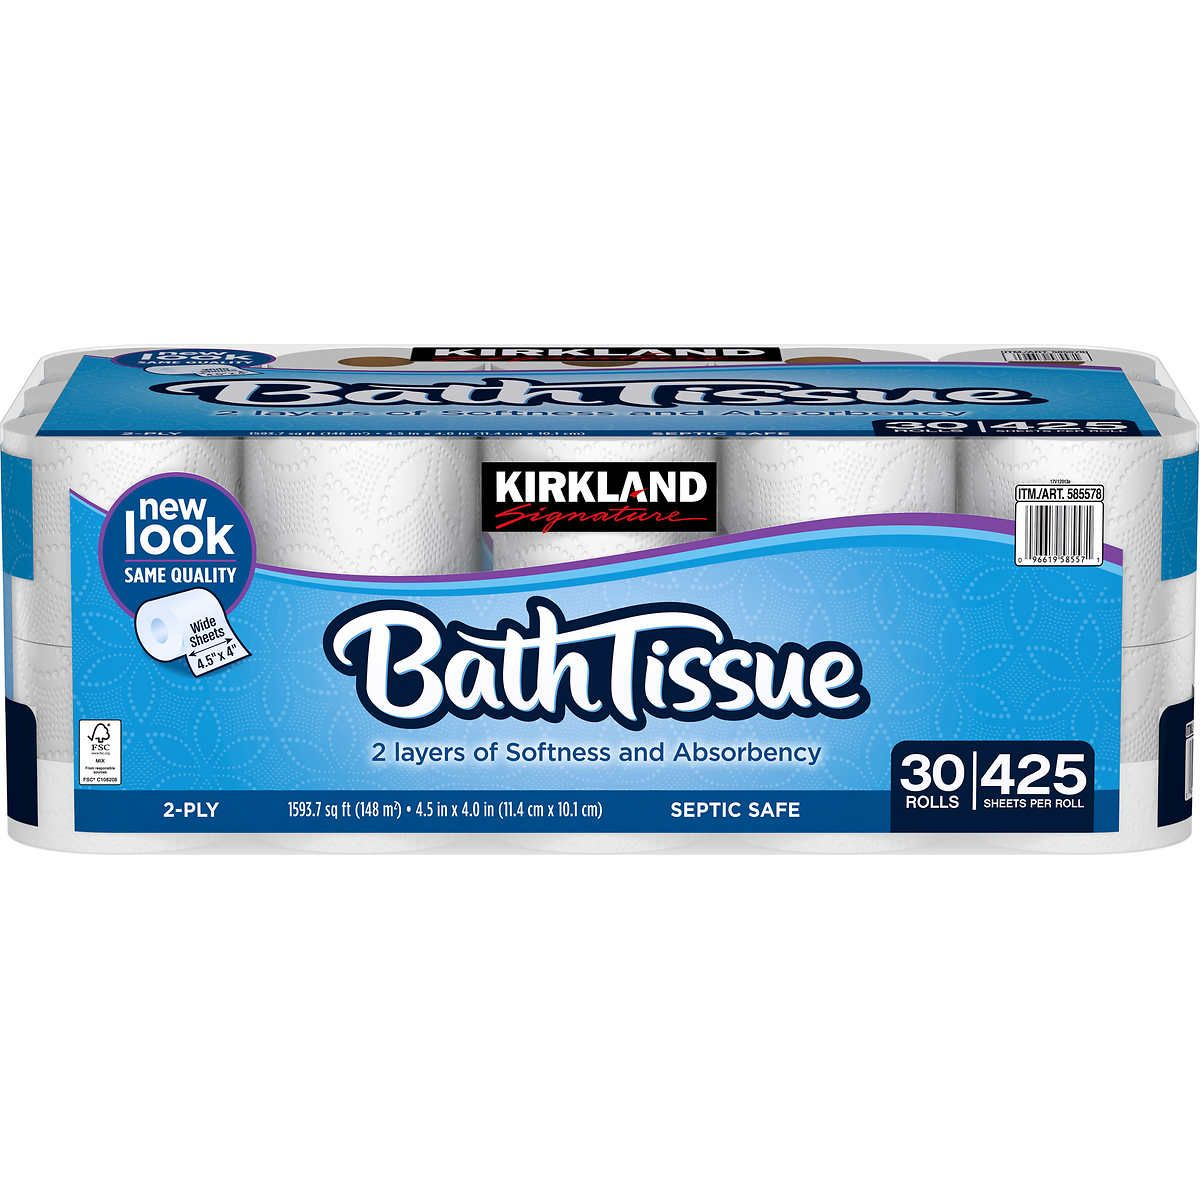 Kirkland Signature Bath Tissue, 2-Ply, 425 sheets, 30 rolls